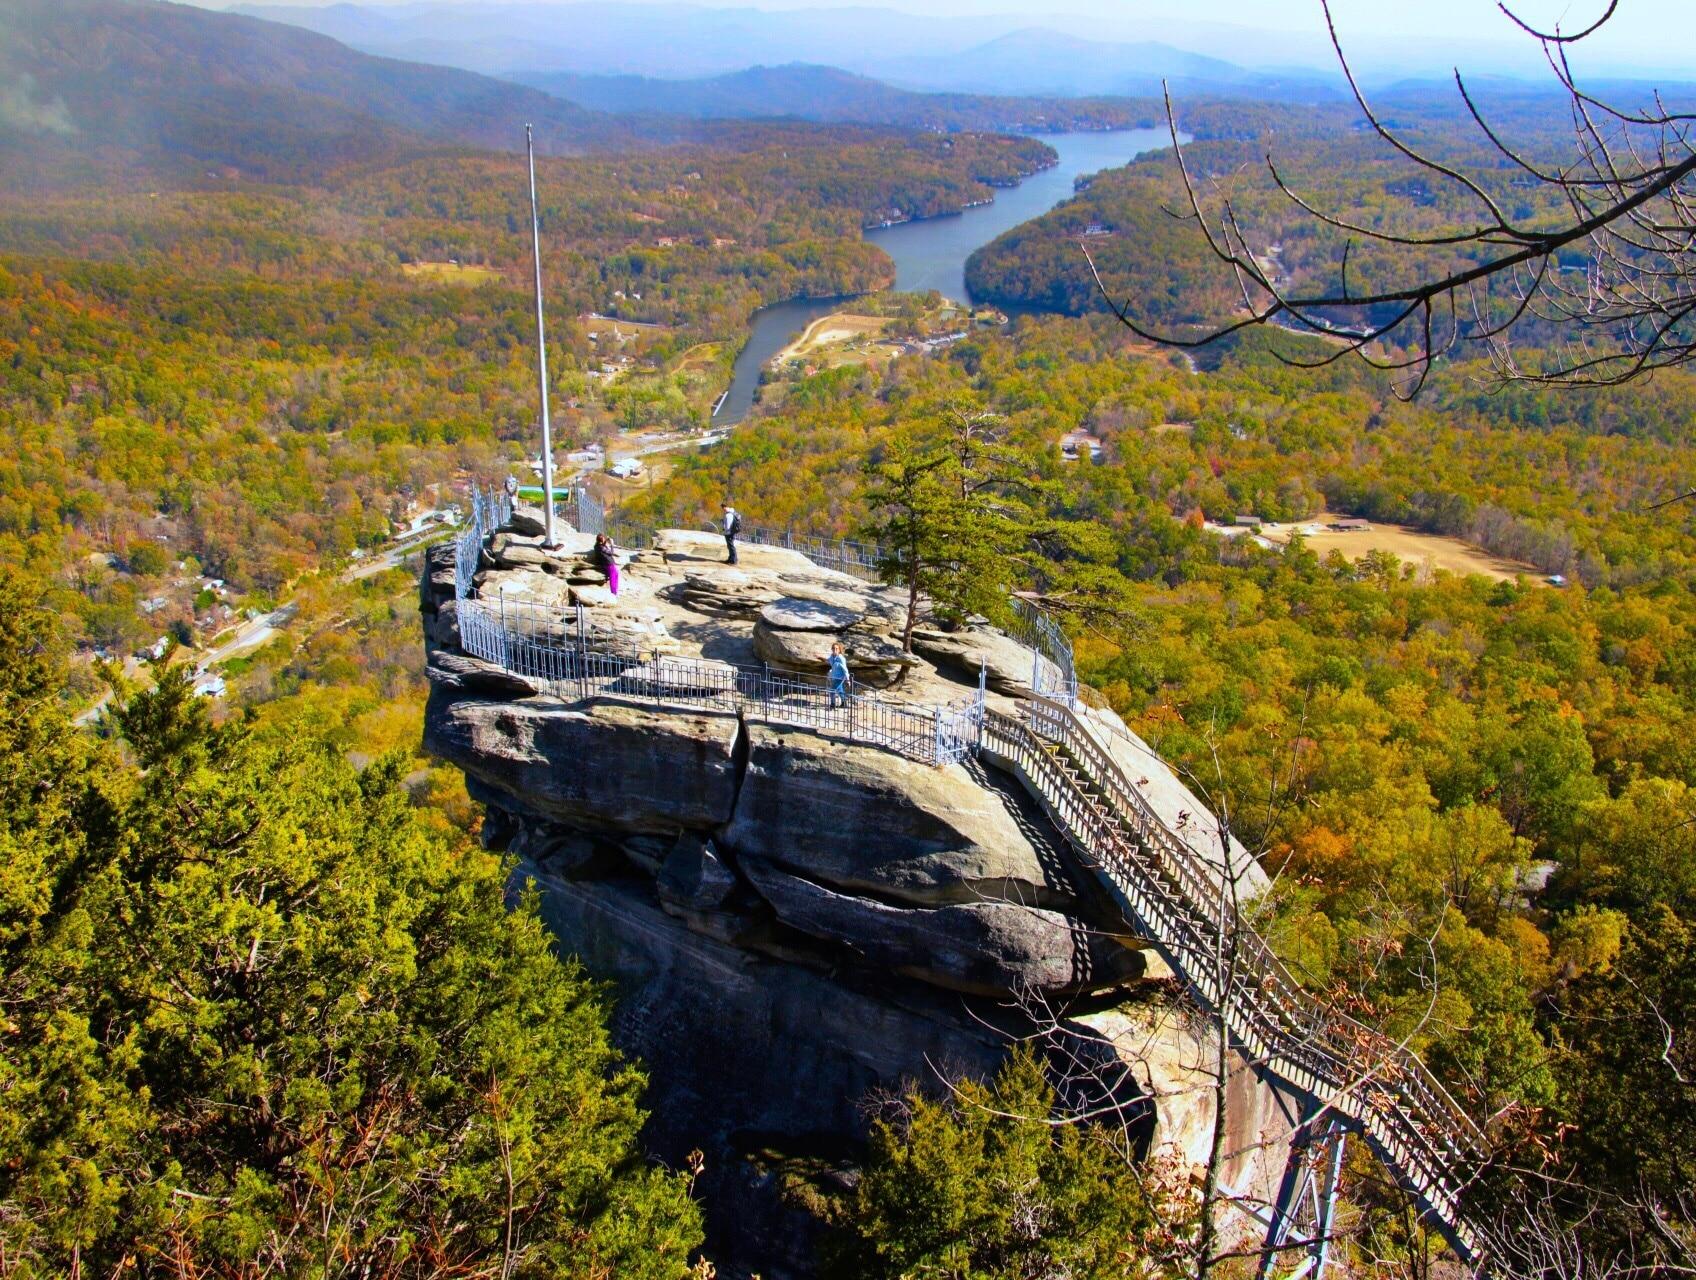 Lake Lure, North Carolina, United States of America